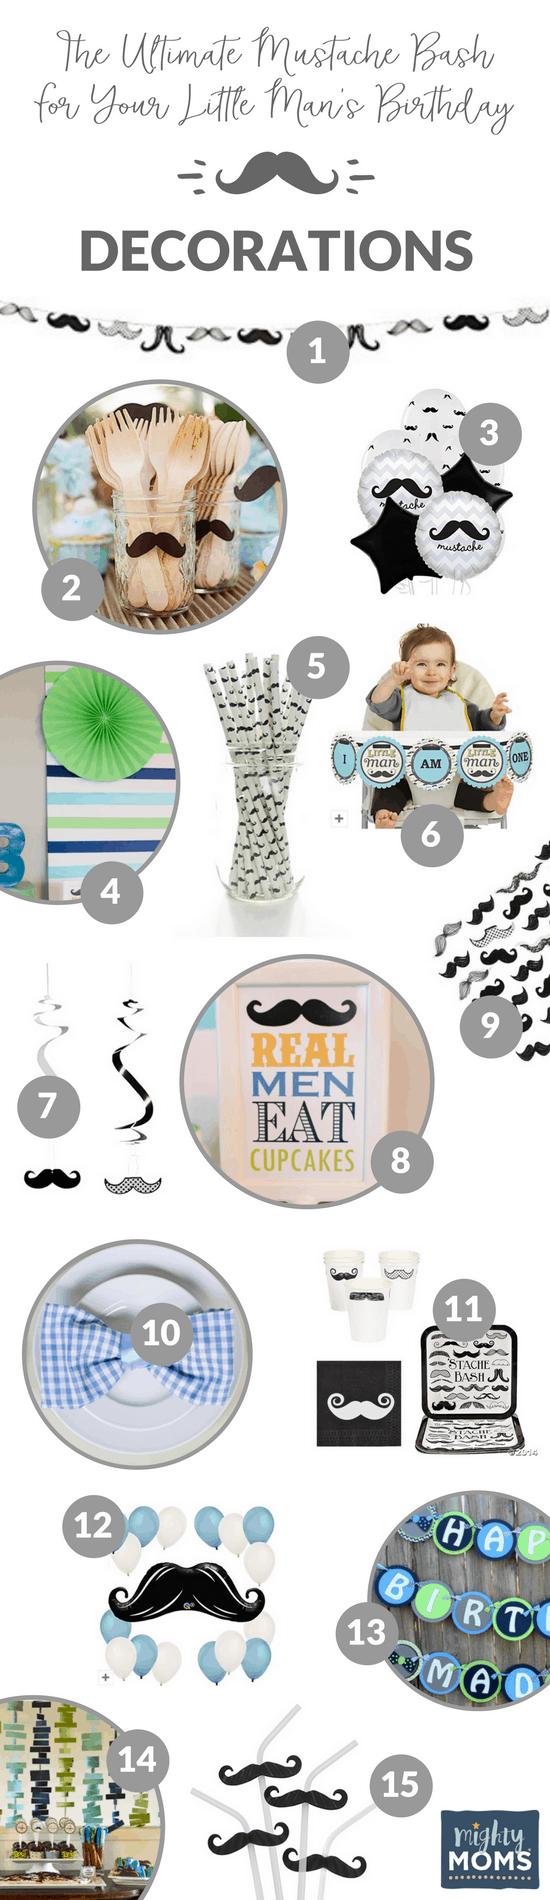 16 Mustache Bash Decor Ideas - MightyMoms.club